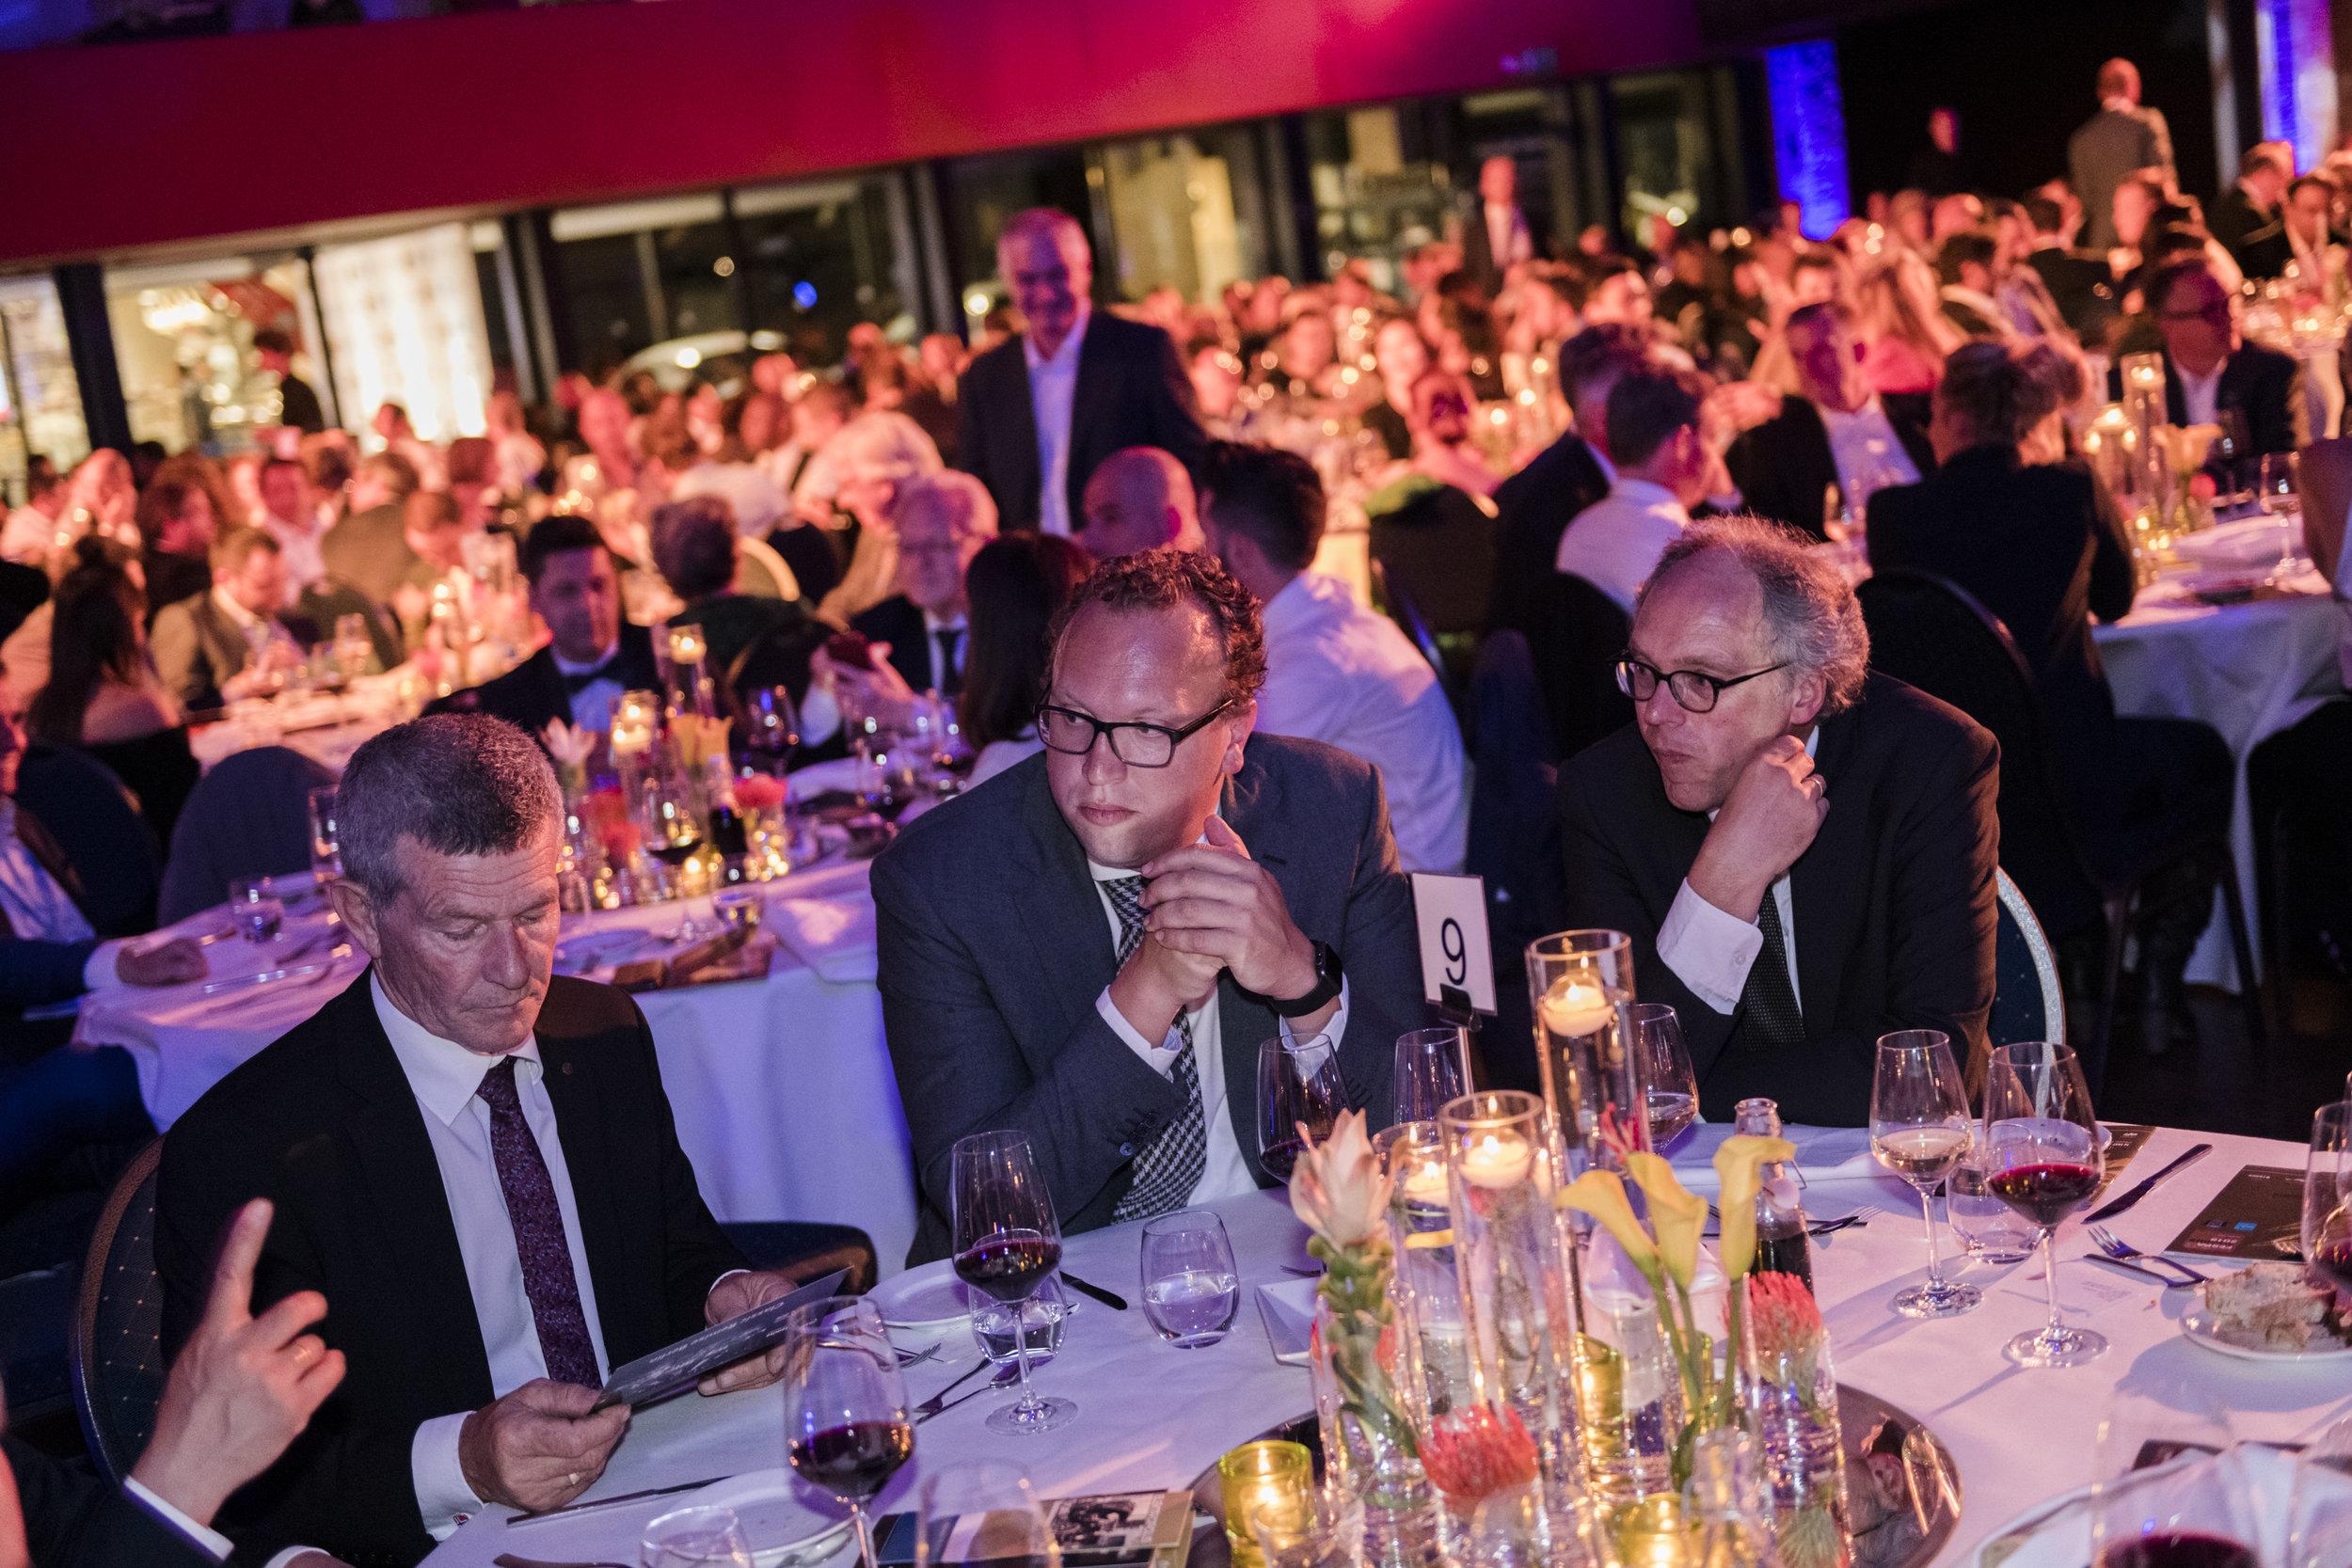 2018-05-16_FESPA_Awards_0130.jpg